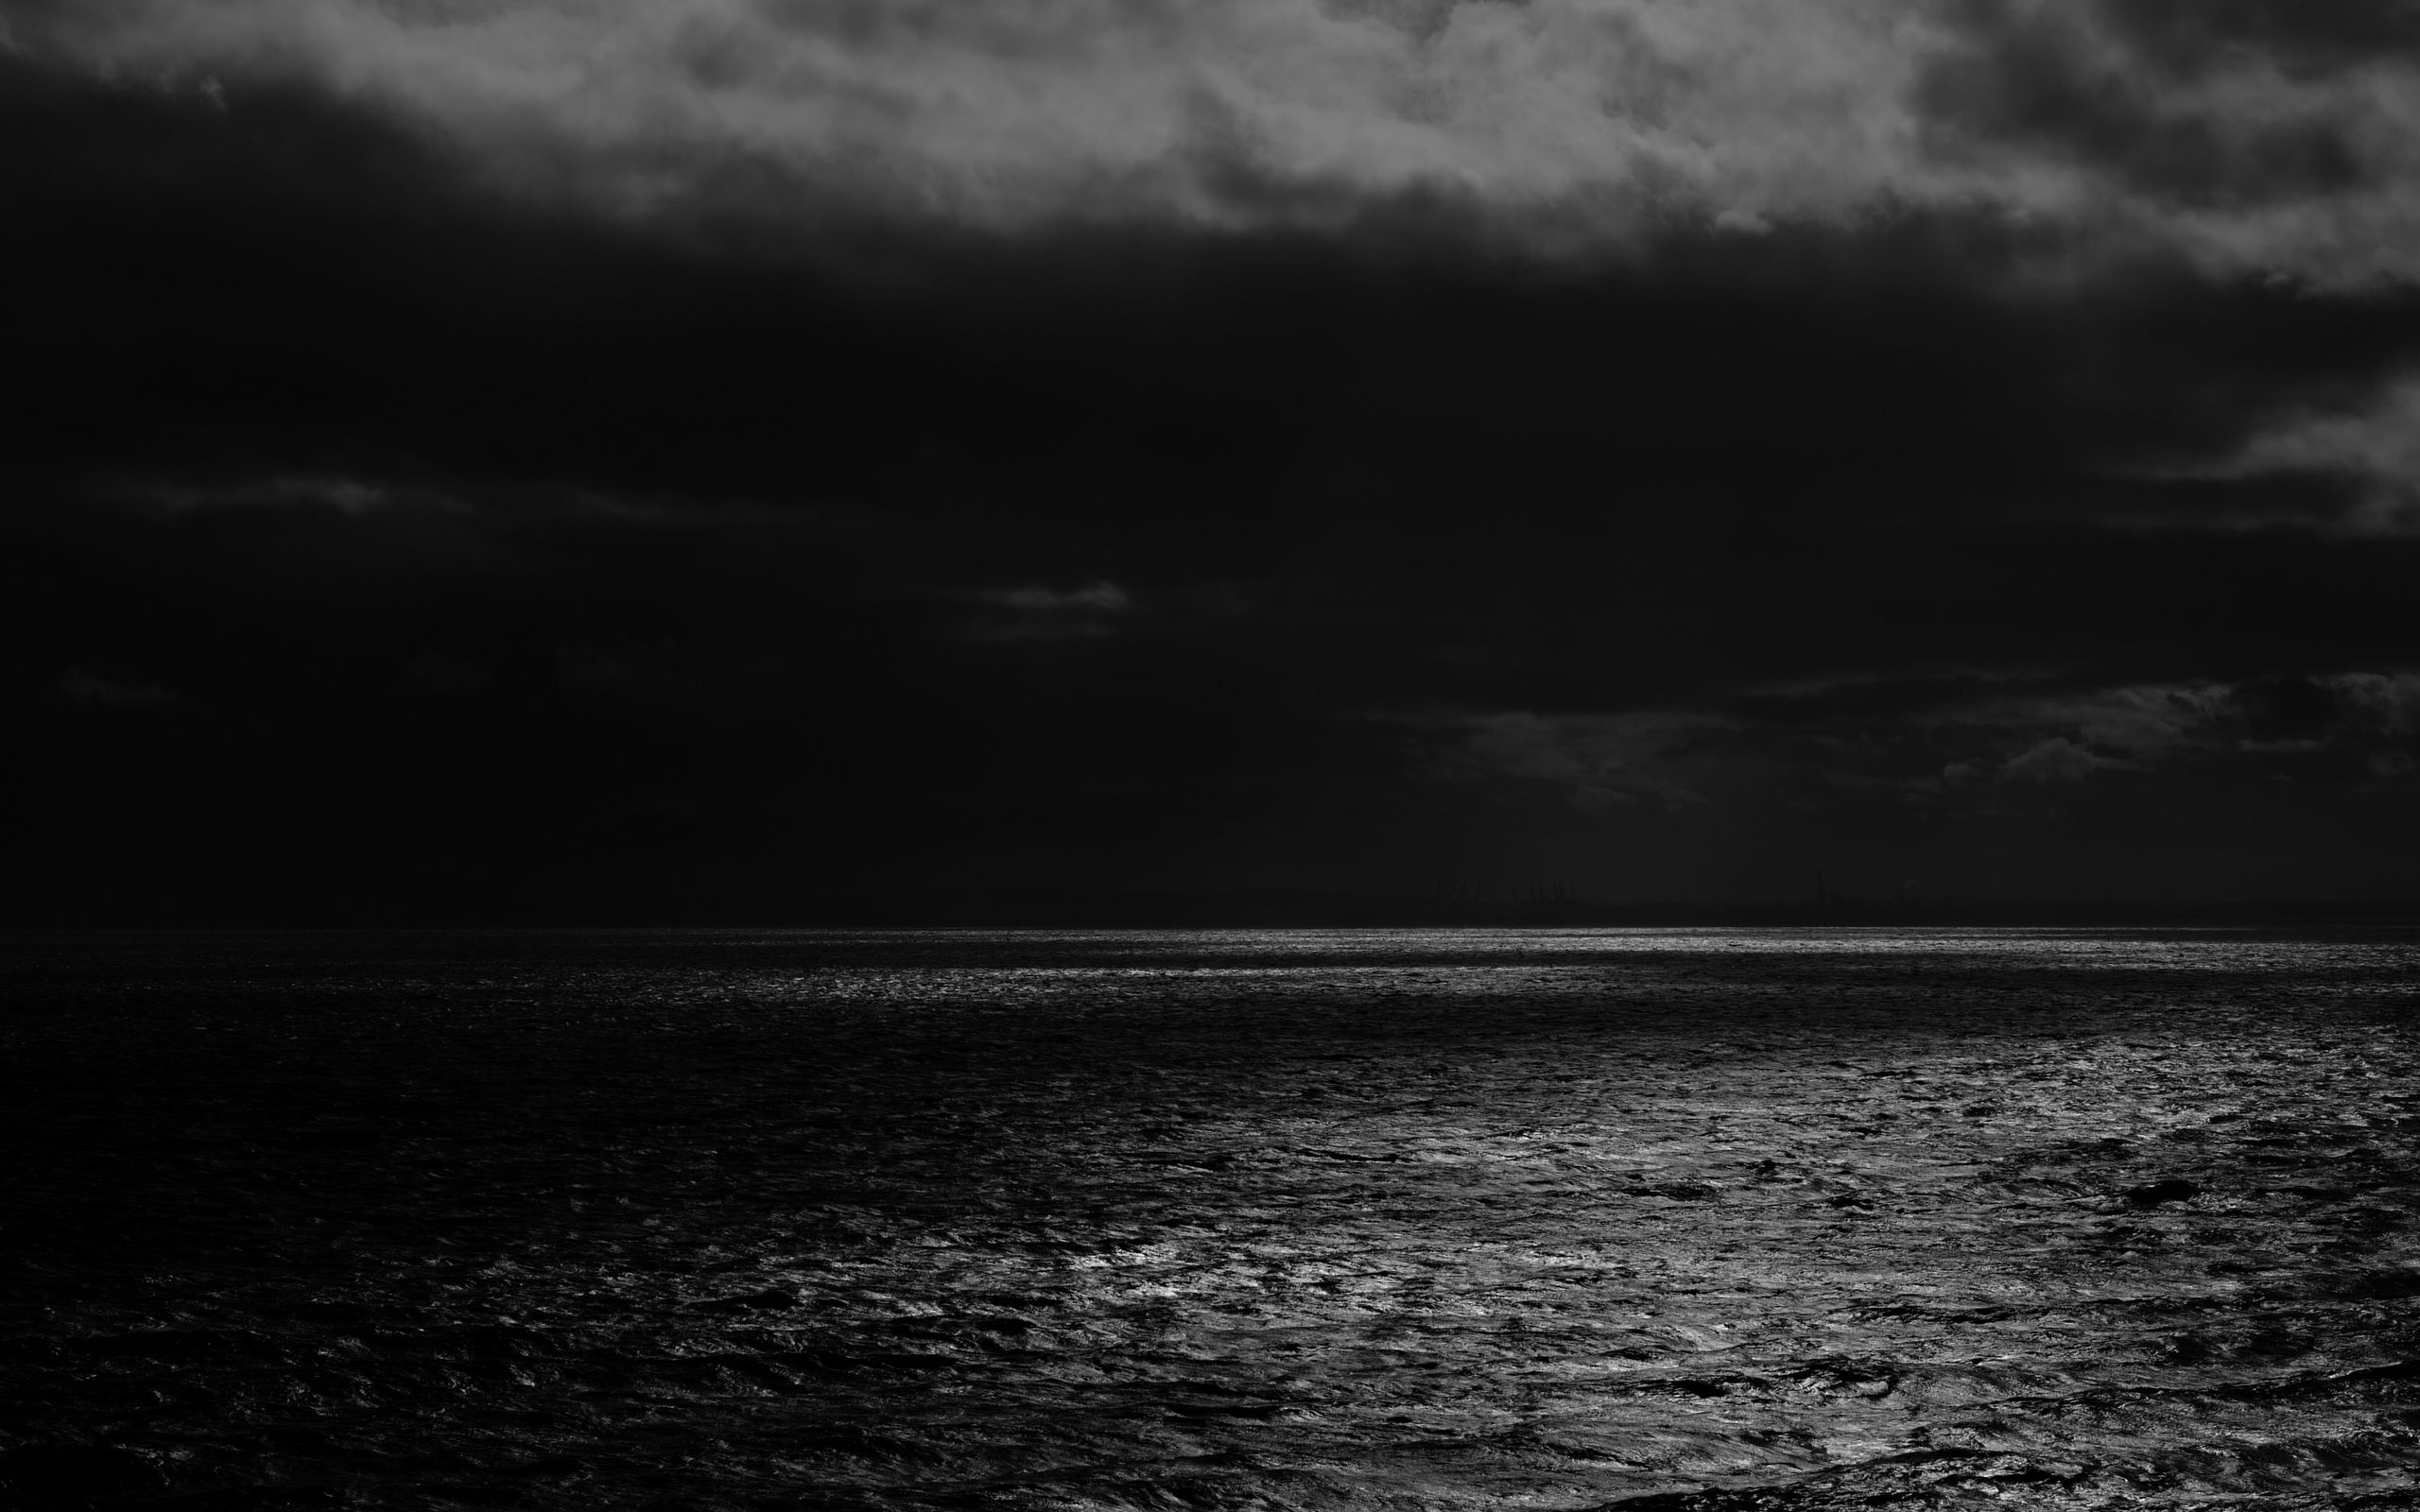 2560x1600 Wallpaper sea, horizon, bw, overcast, clouds, ripples